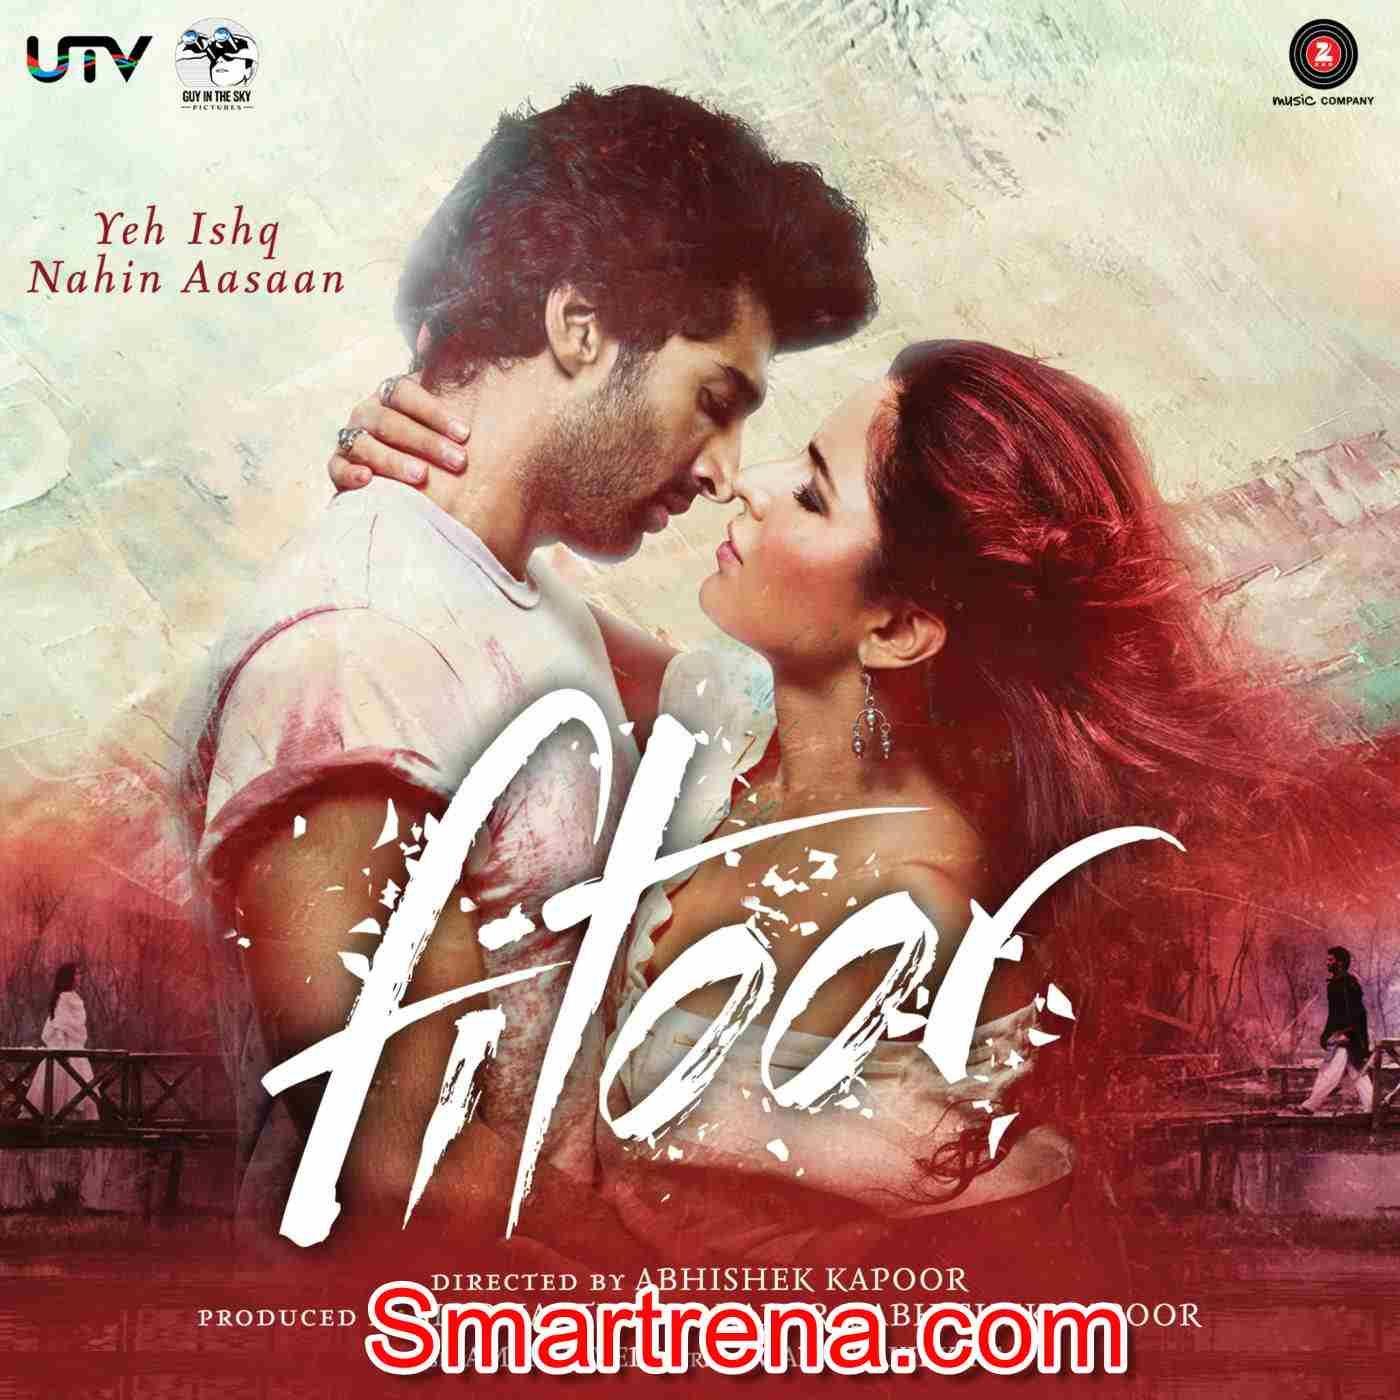 Dor 9th March 2017 Abc Radio Daar Download Hq Full Hindi Movies Bollywood Music Bollywood Songs